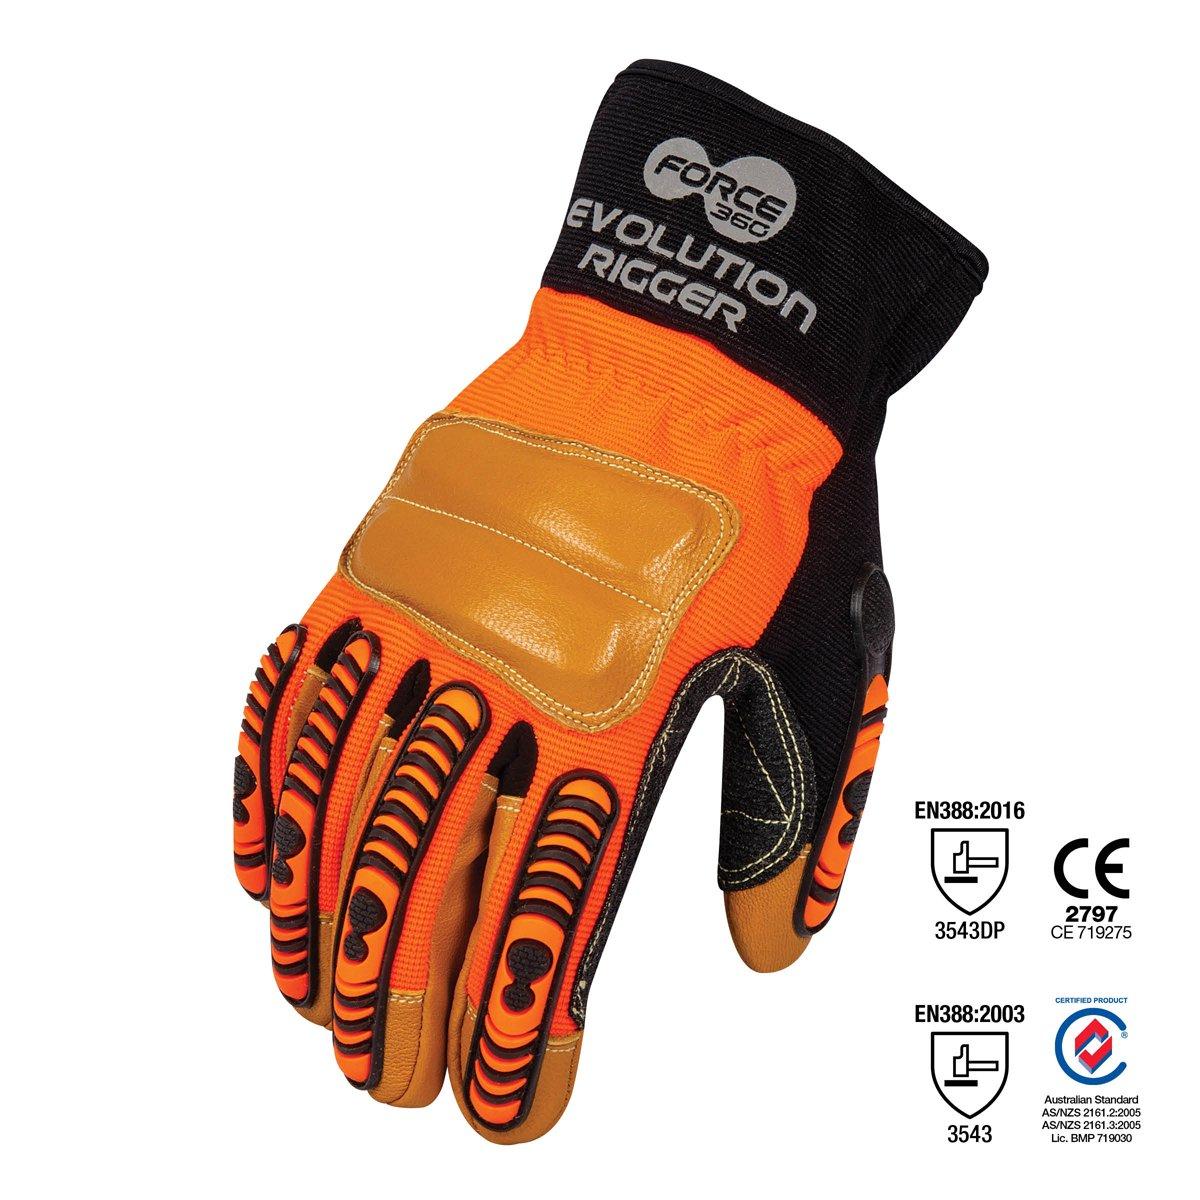 Force360 Evolution Cut 5 Riggers Glove